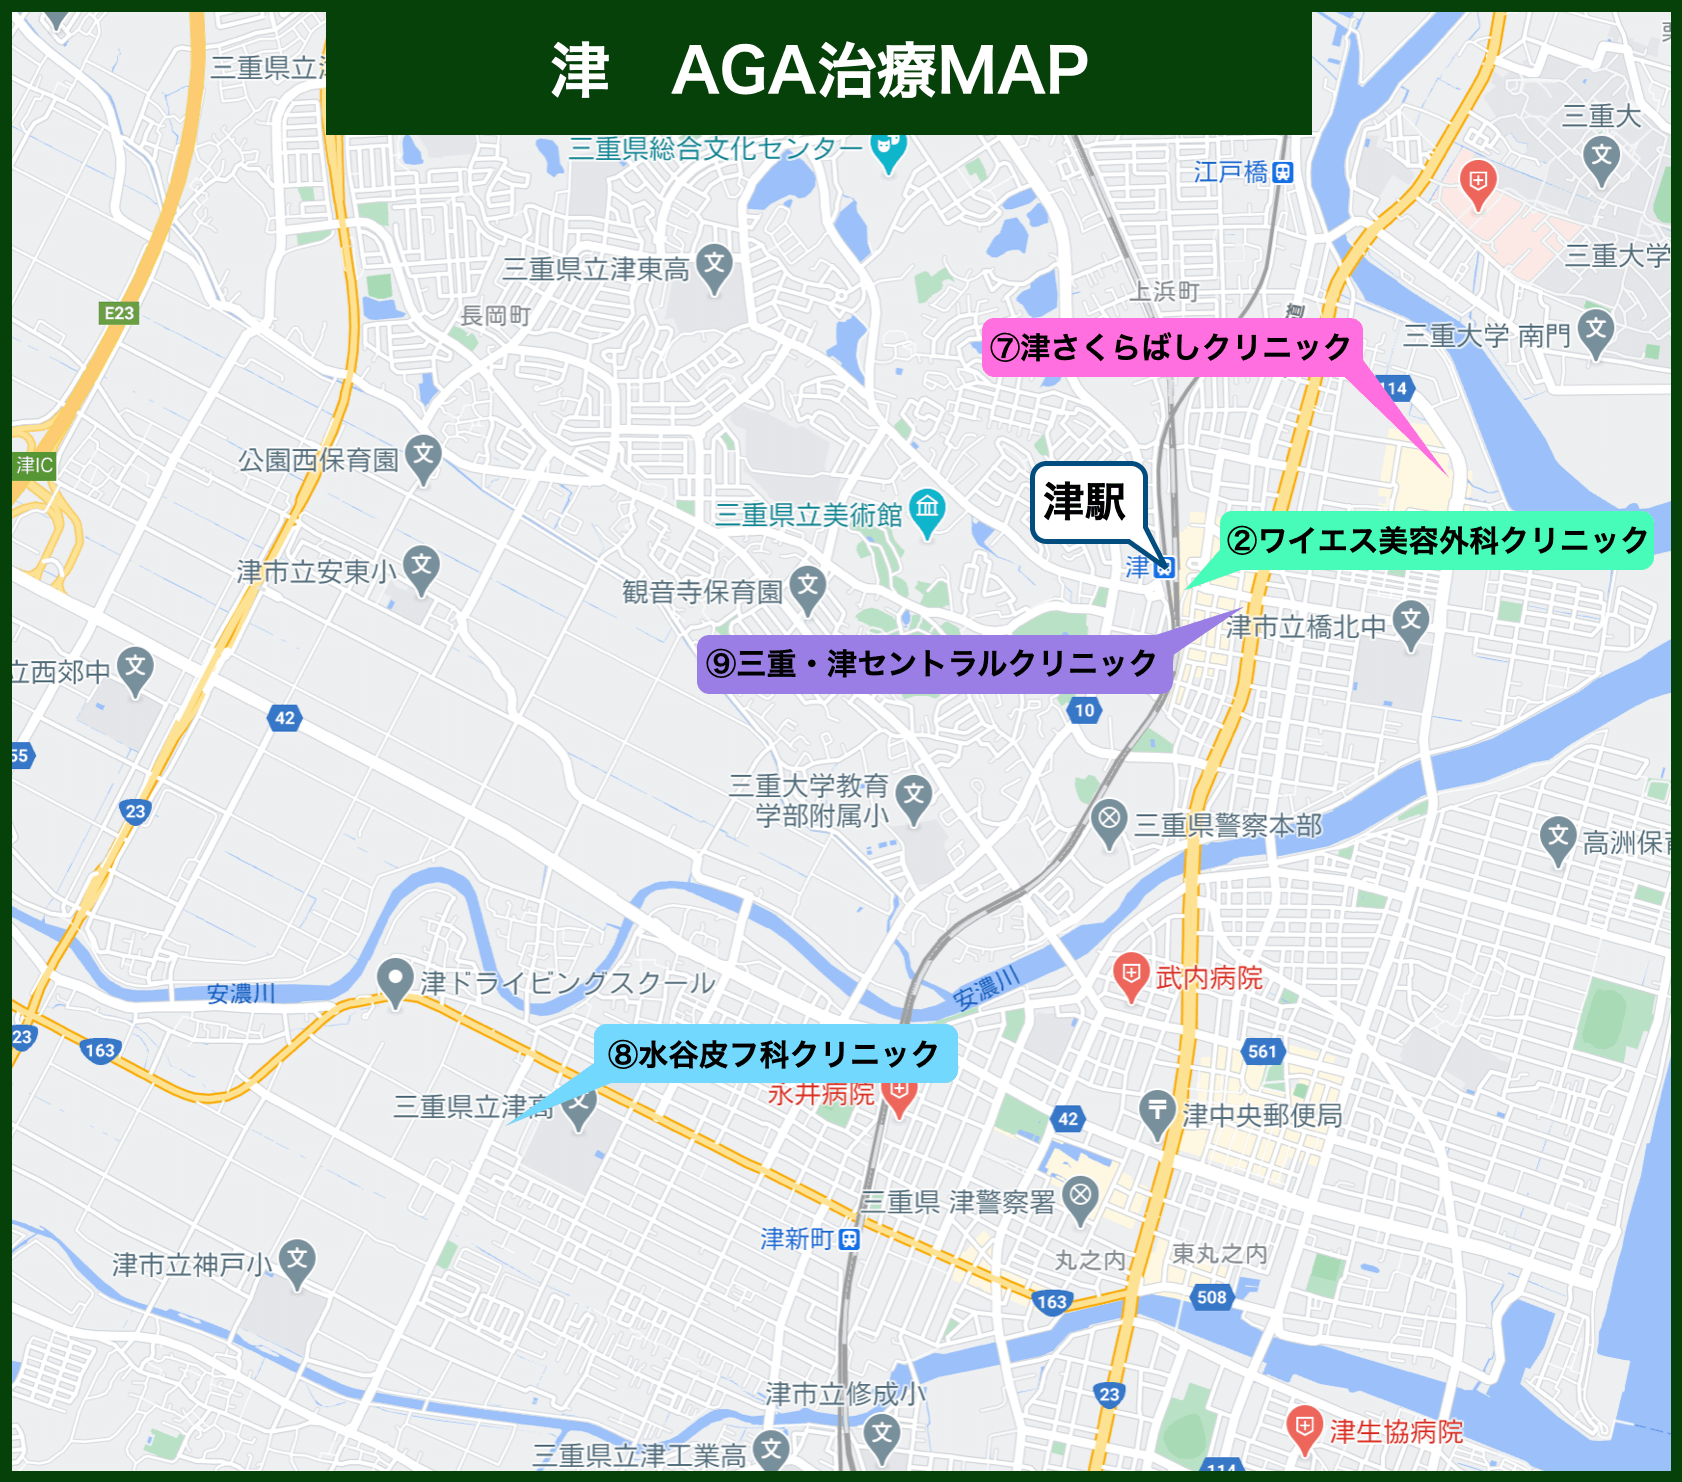 津 AGA治療MAP